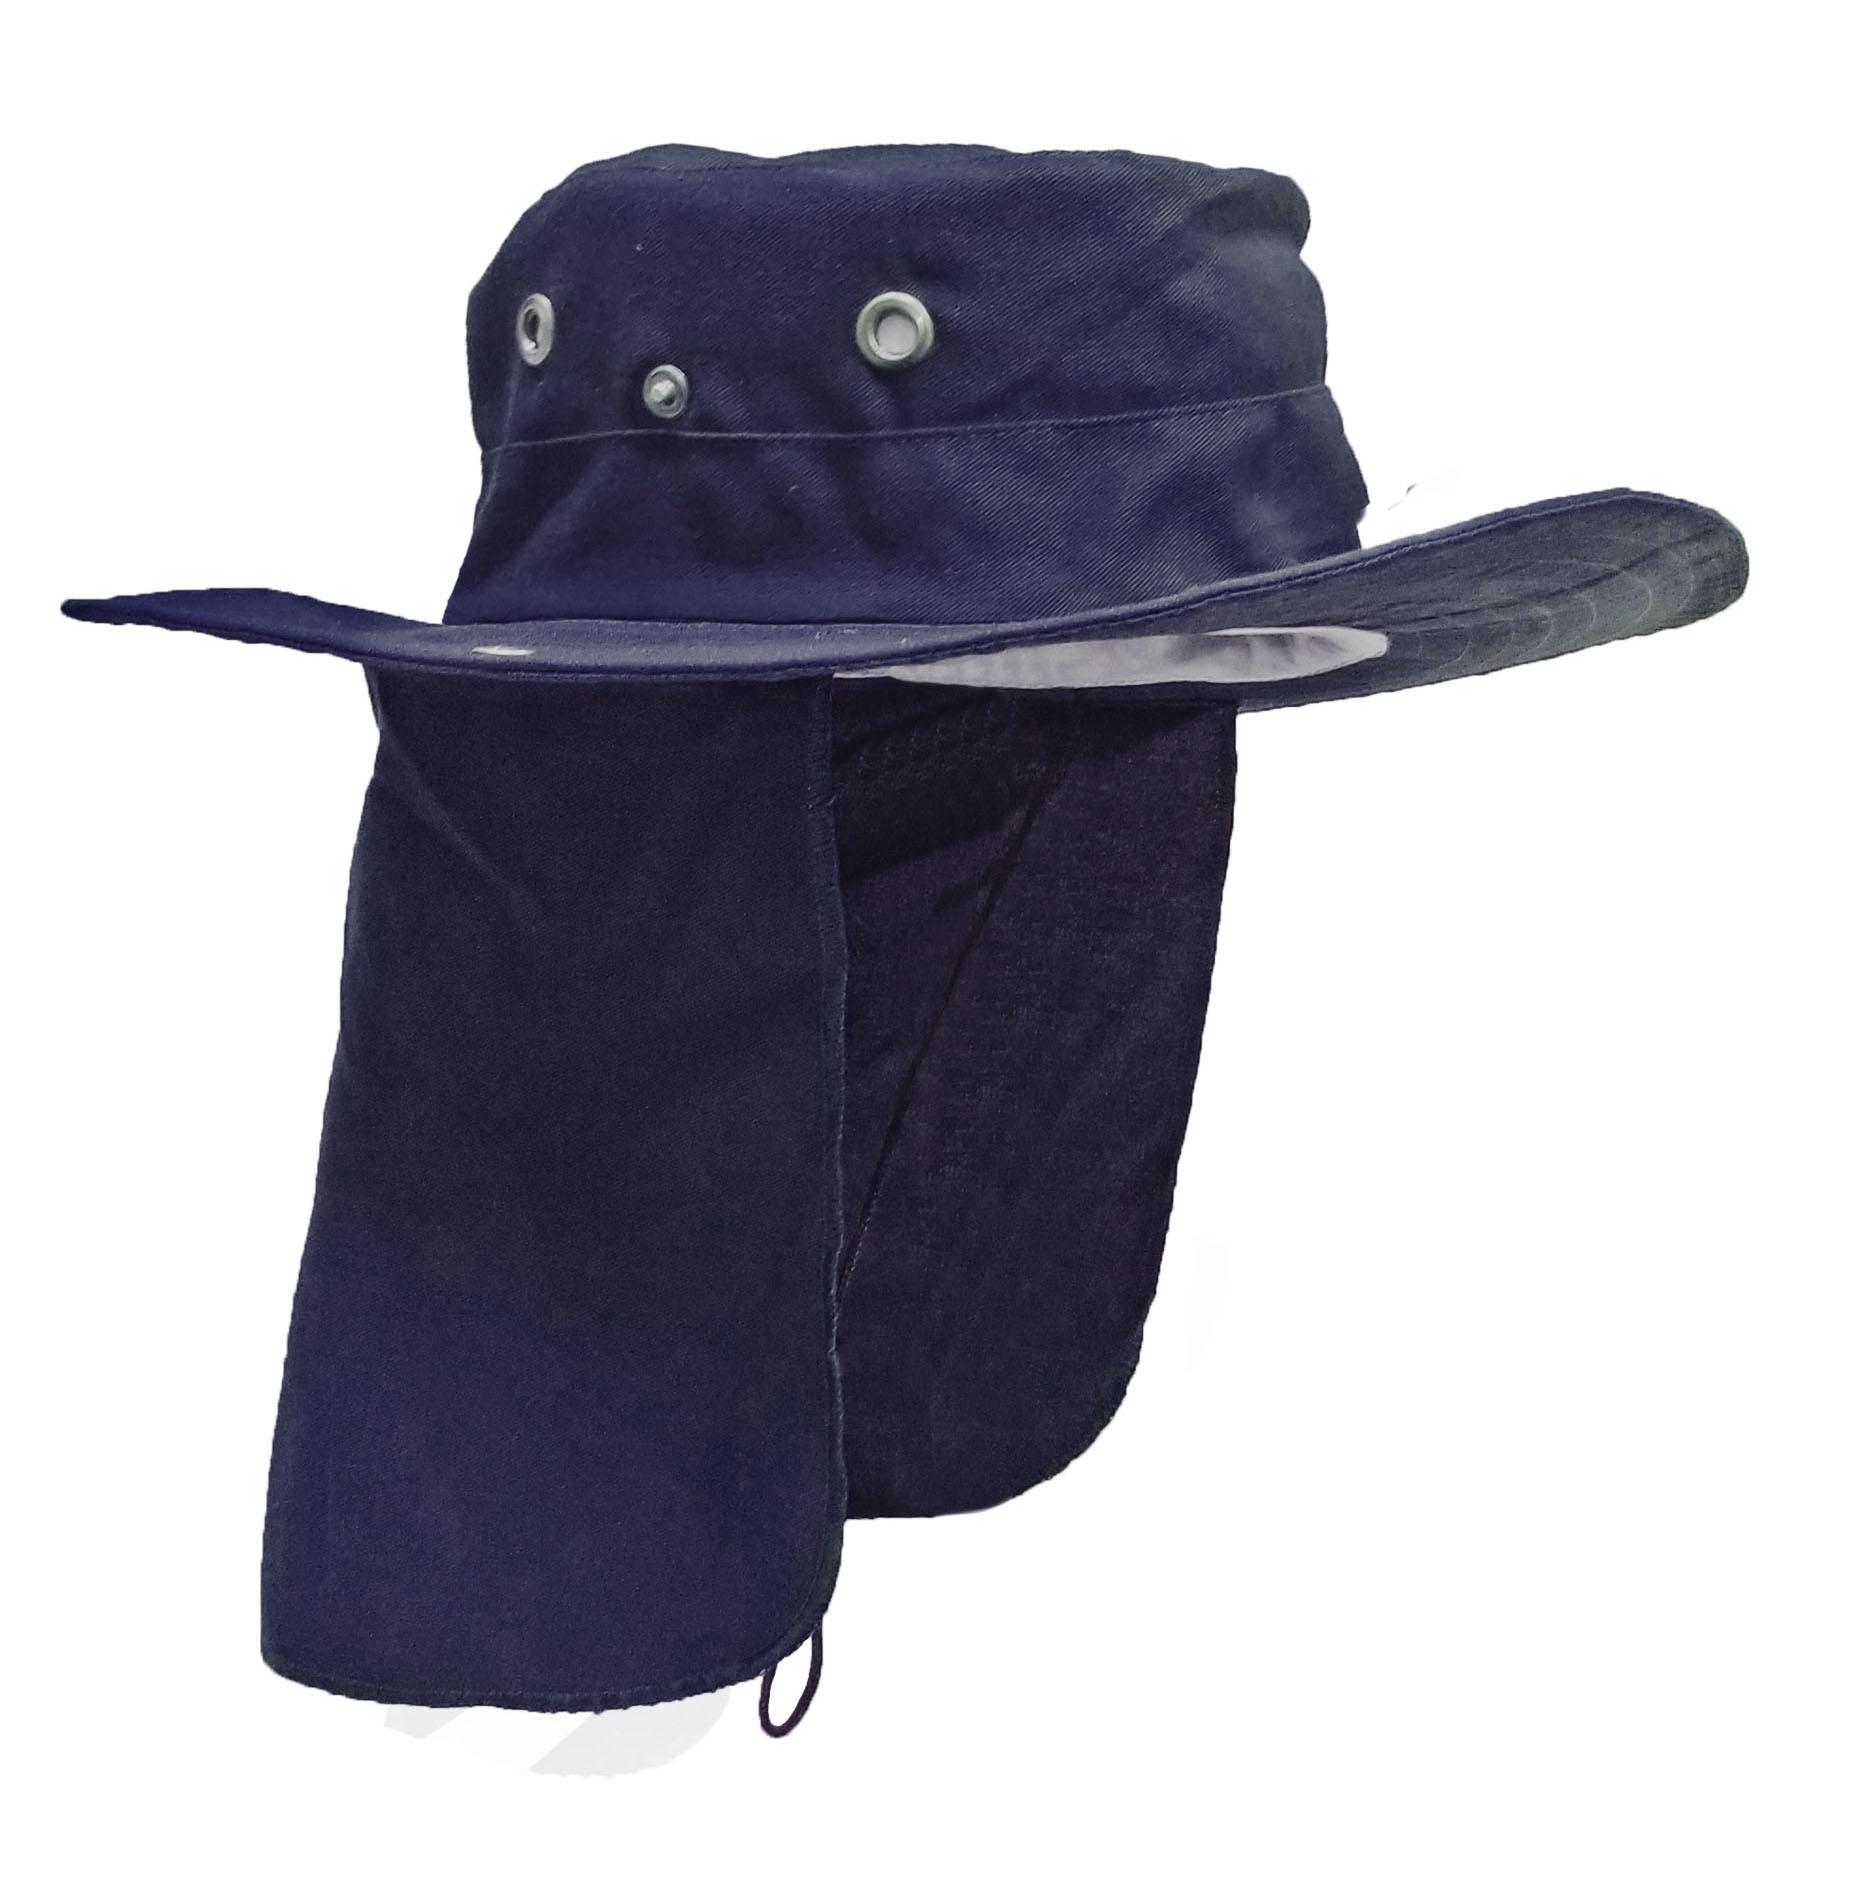 Sombrero Con Tapa Sol Azul Marino